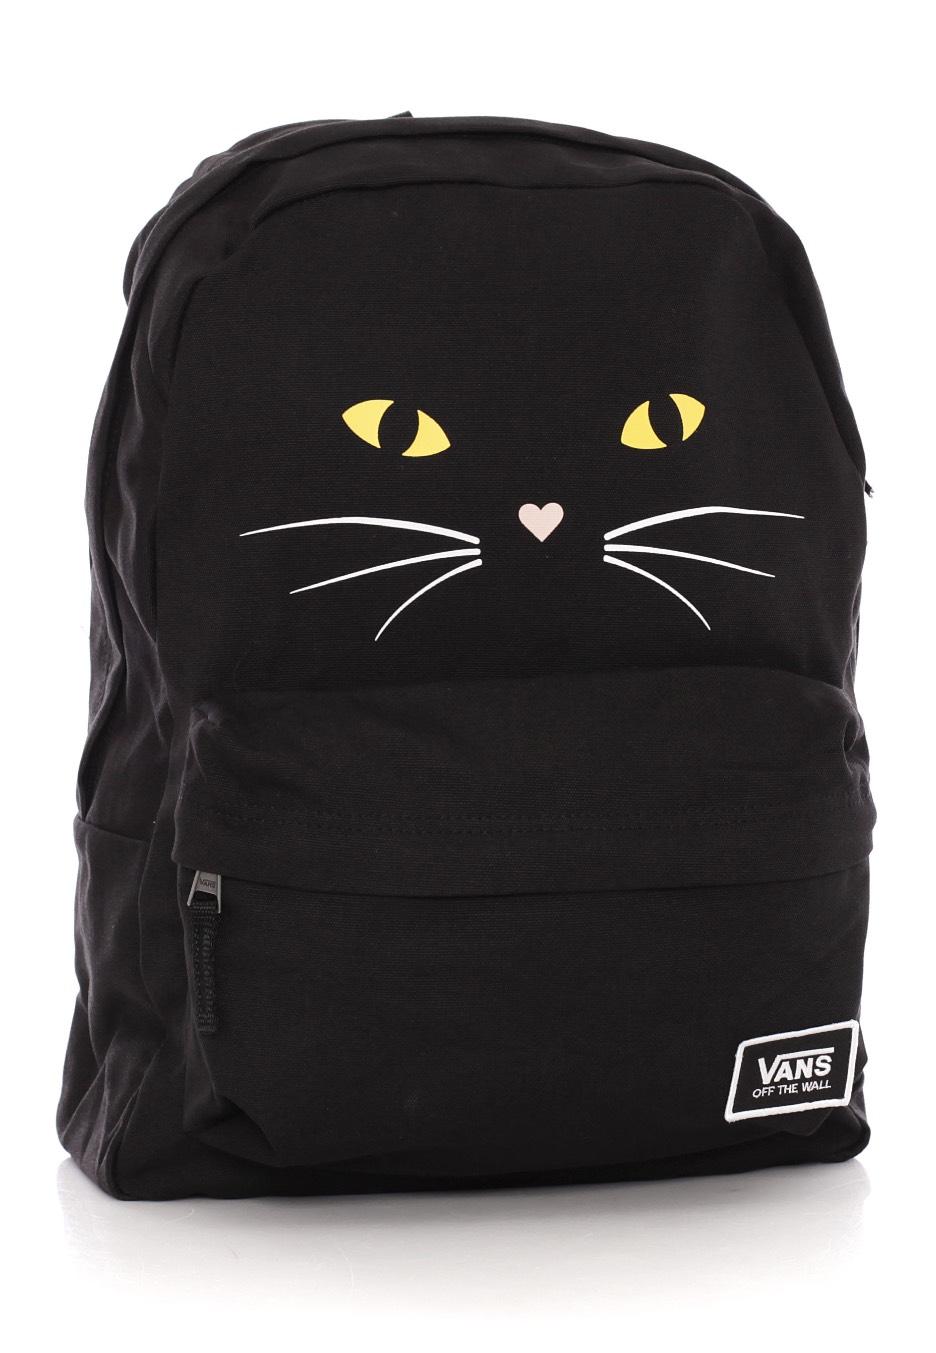 Vans - Realm Classic Black Cat - Backpack - Impericon.com UK 4941ef1b84857